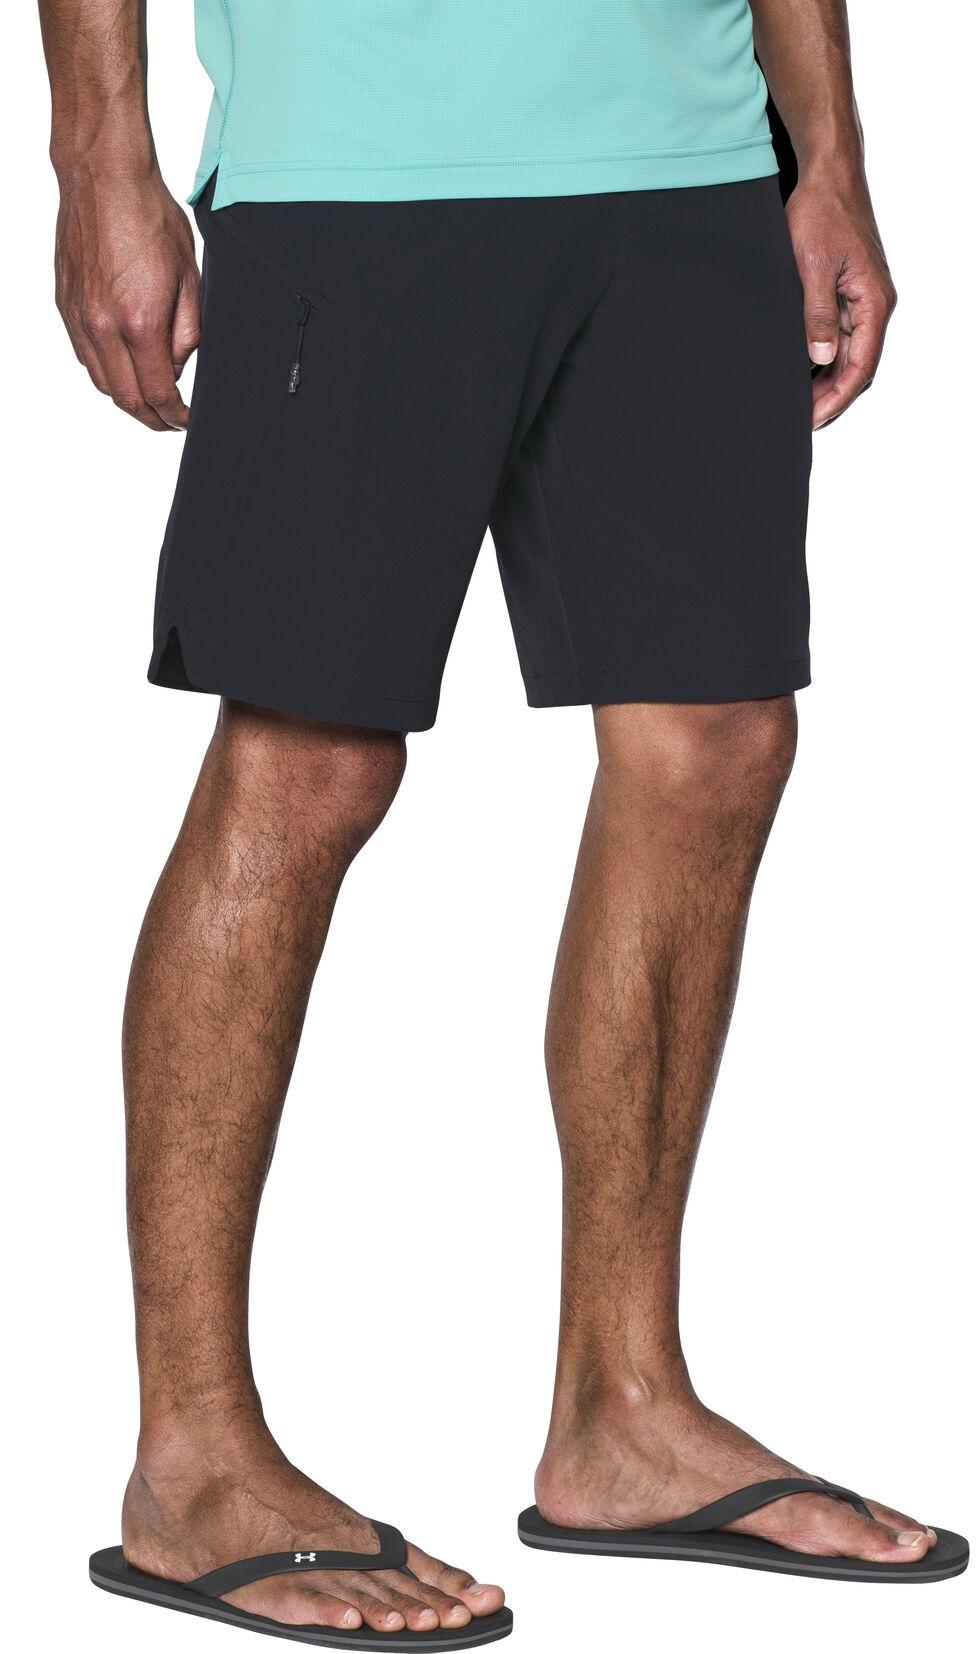 Under Armour Men's Light Grey Solid Board Shorts, Black, hi-res